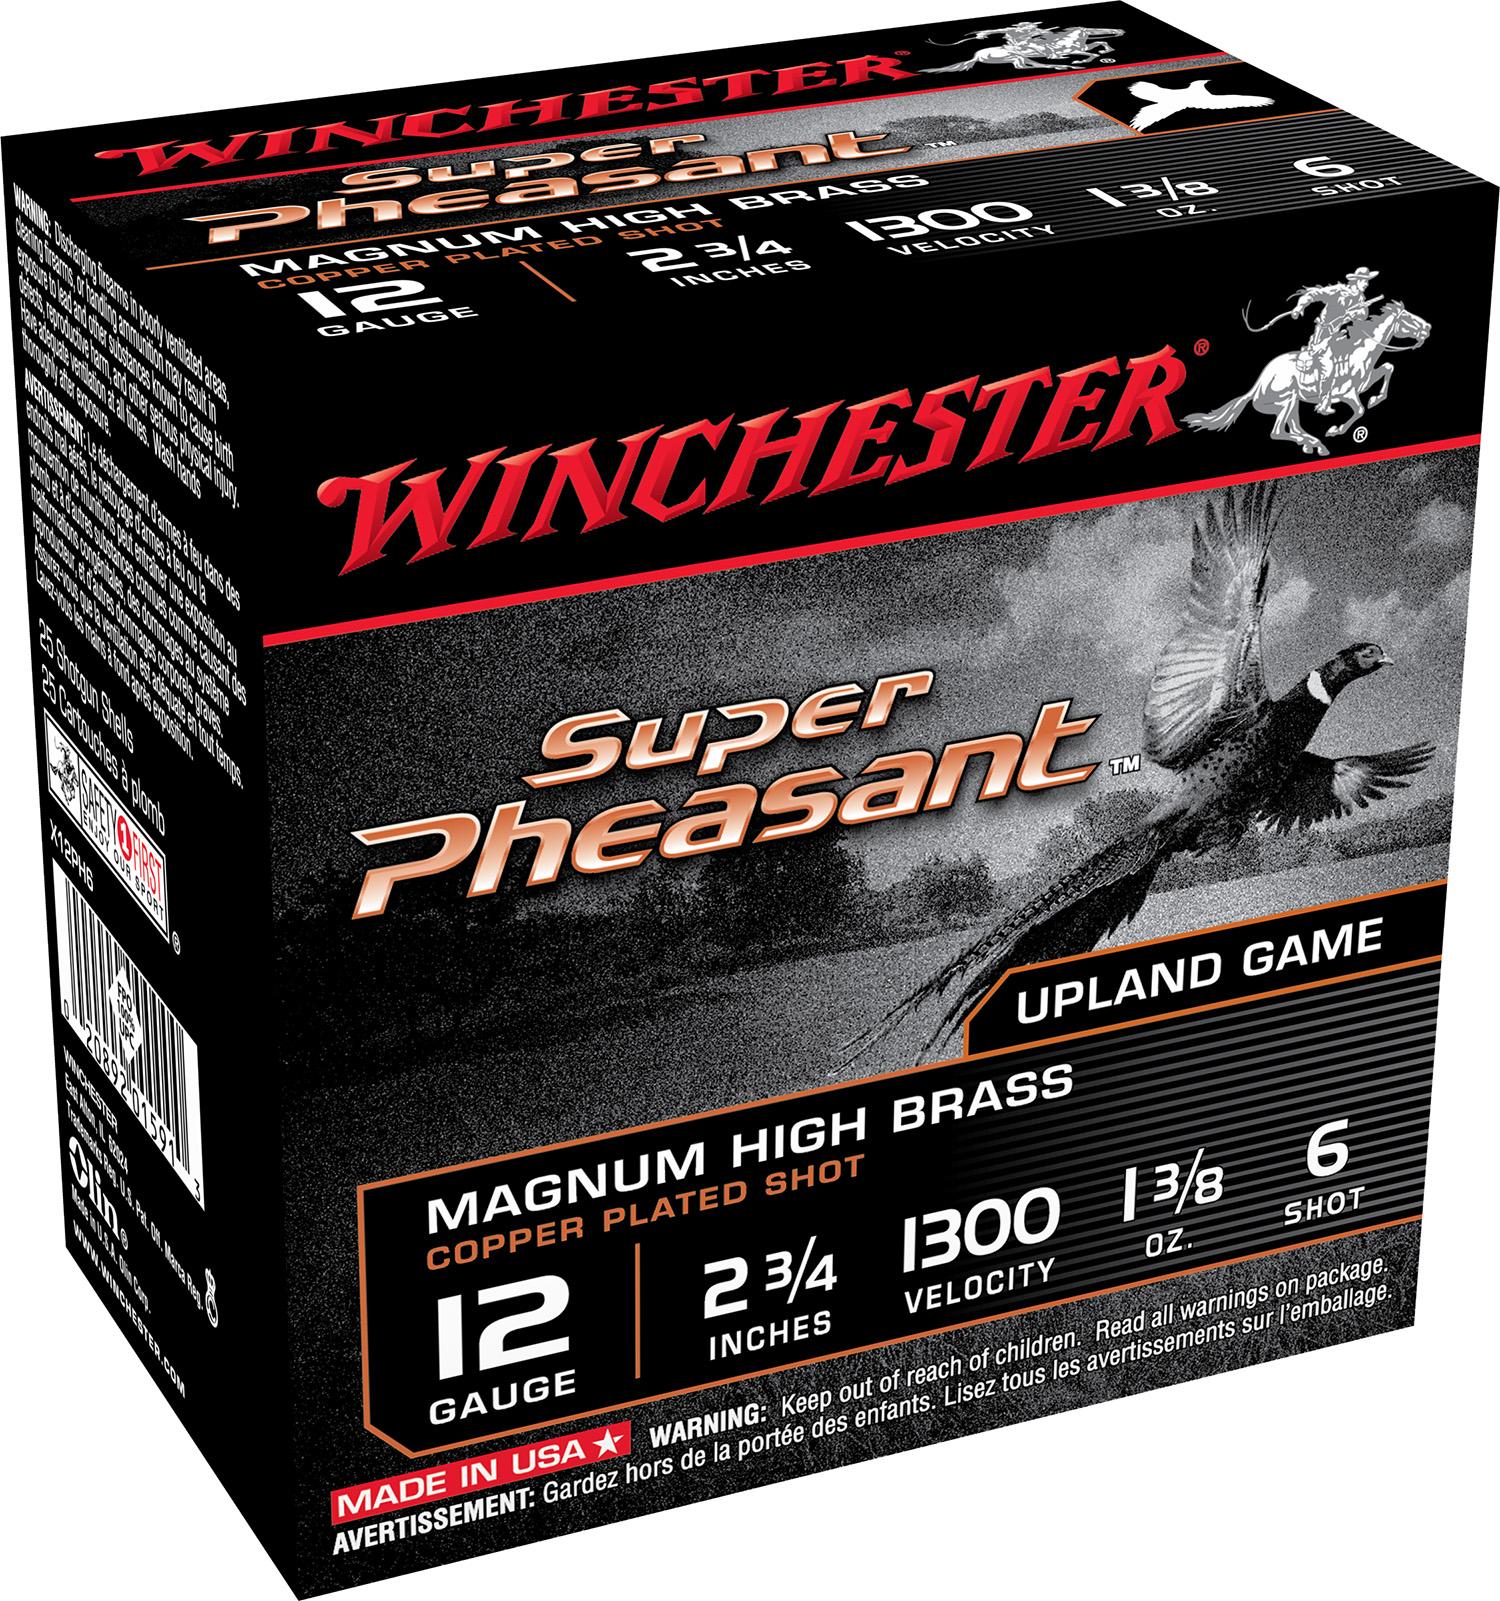 Winchester Ammo X12PH6 Super Pheasant Magnum High Brass  12 Gauge 2.75